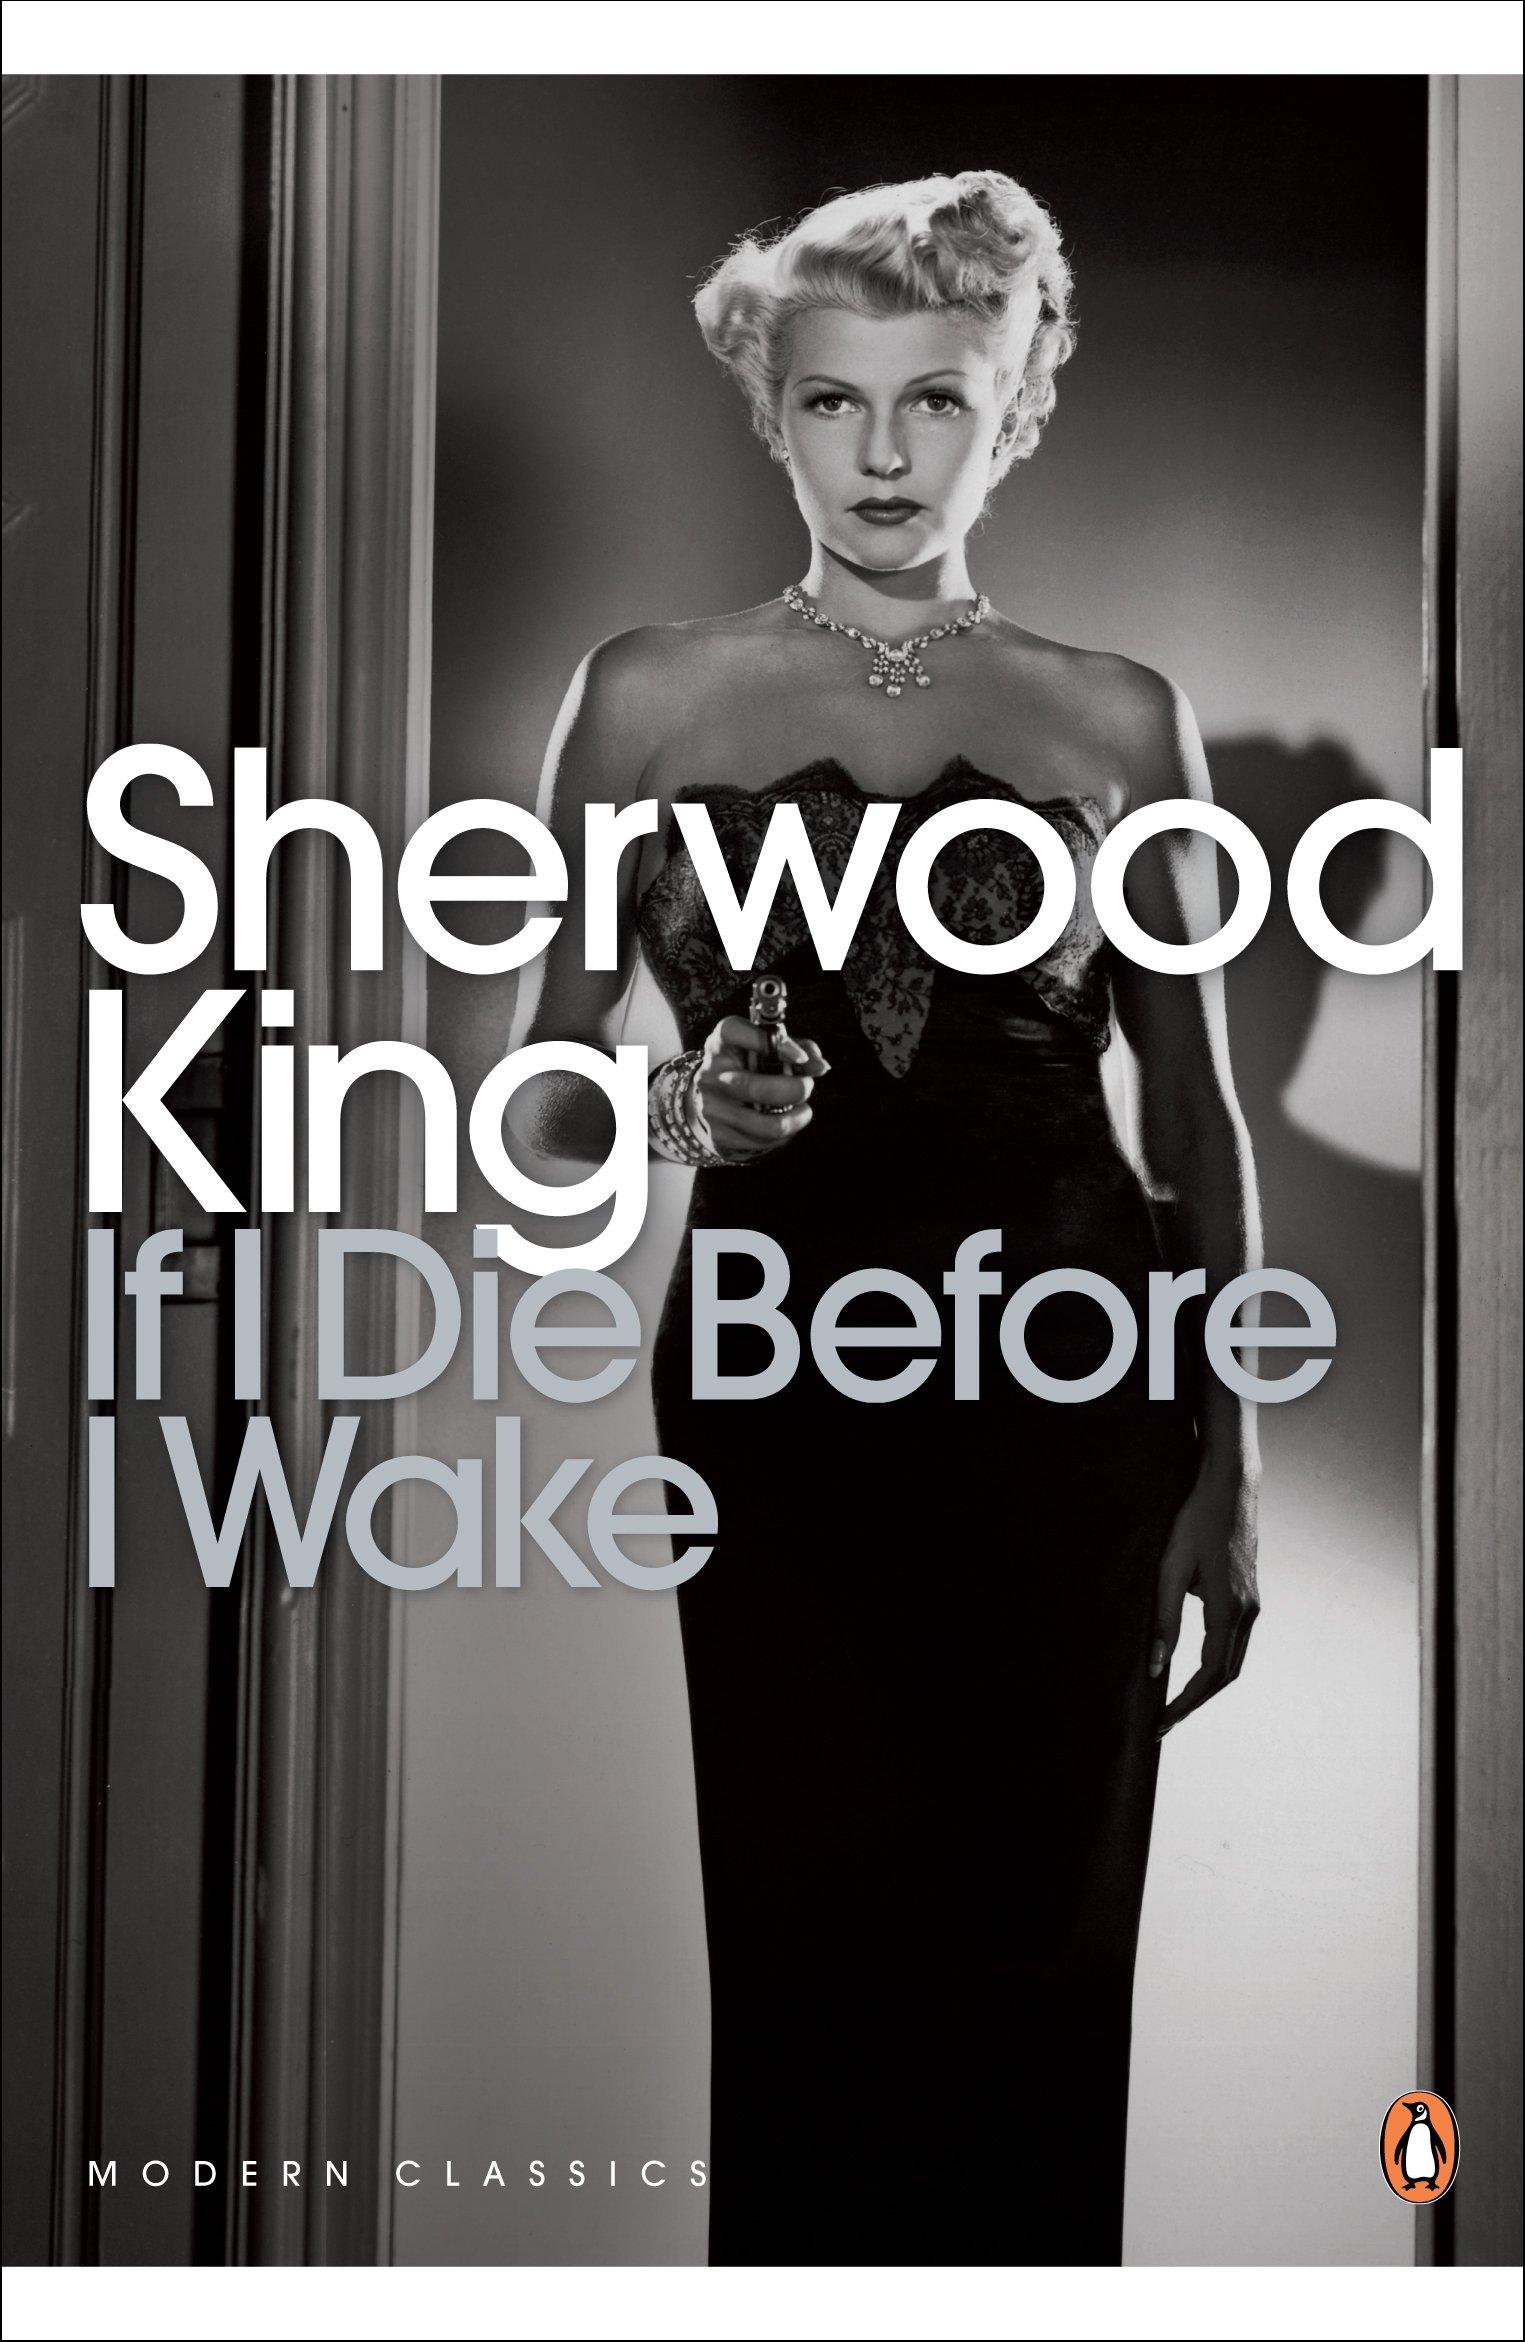 Read Online Penguin Classics If I Die Before I Wake (Penguin Modern Classics) Text fb2 ebook